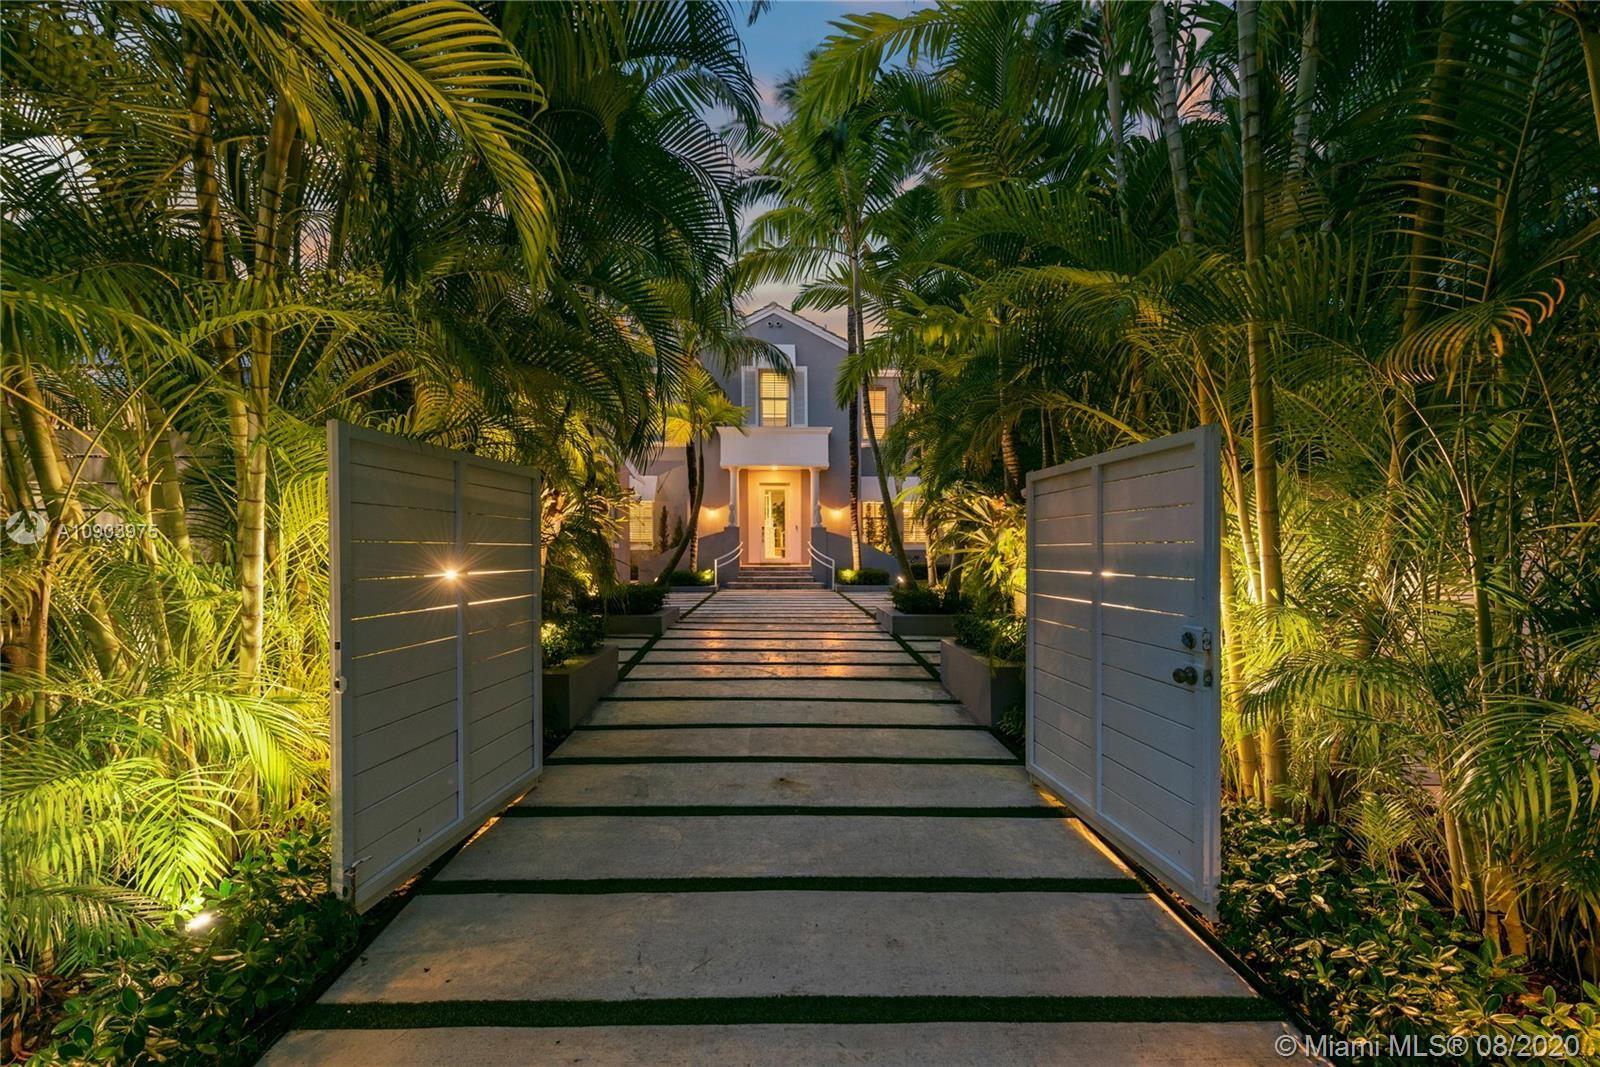 919 Belle Meade Island Dr, Miami, FL 33138 - #: A10903975